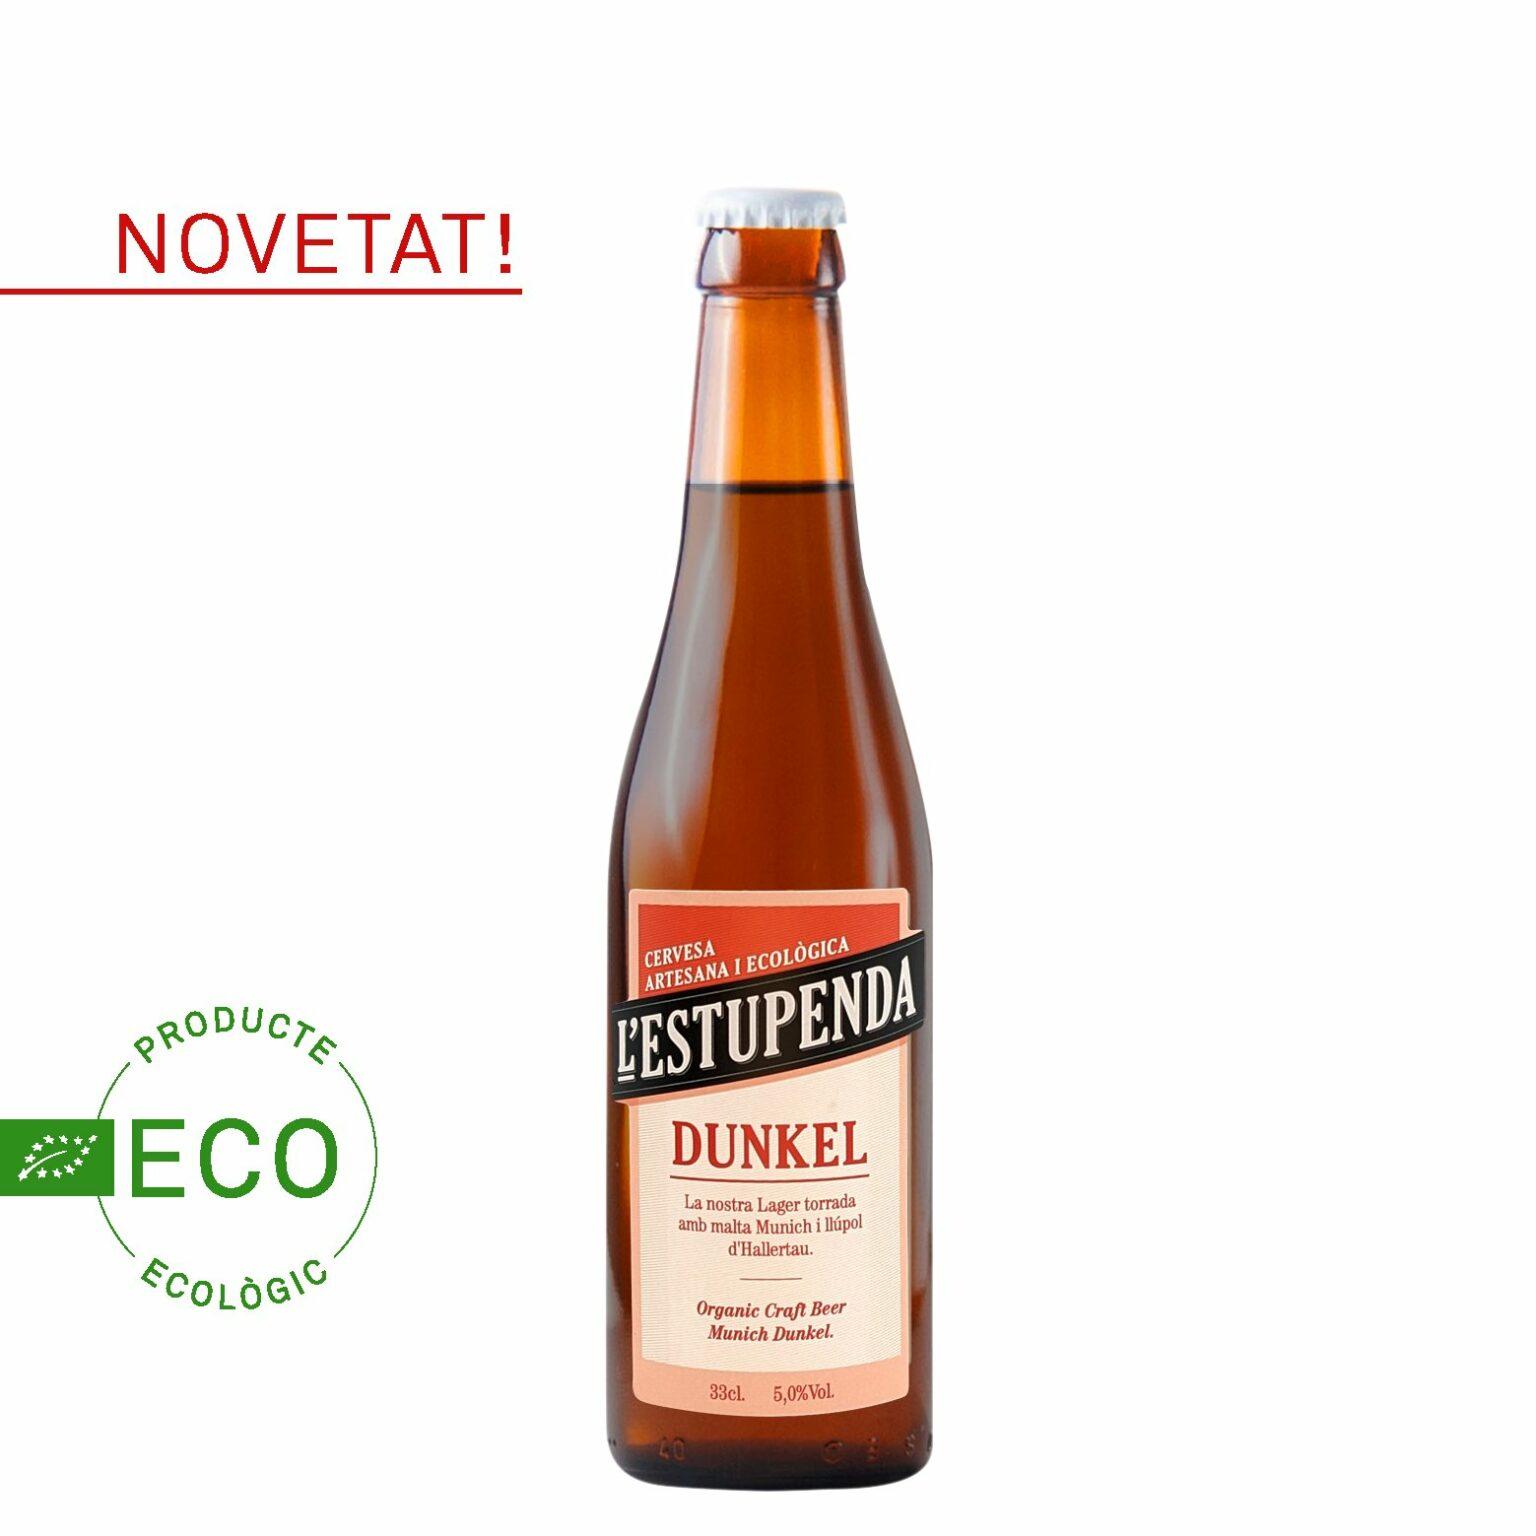 https://www.lestupenda.com/es/wp-content/uploads/sites/9/2021/04/Cervesa-Artesana-Ecològica-lEstupenda-Dunkel-1536x1536.jpg